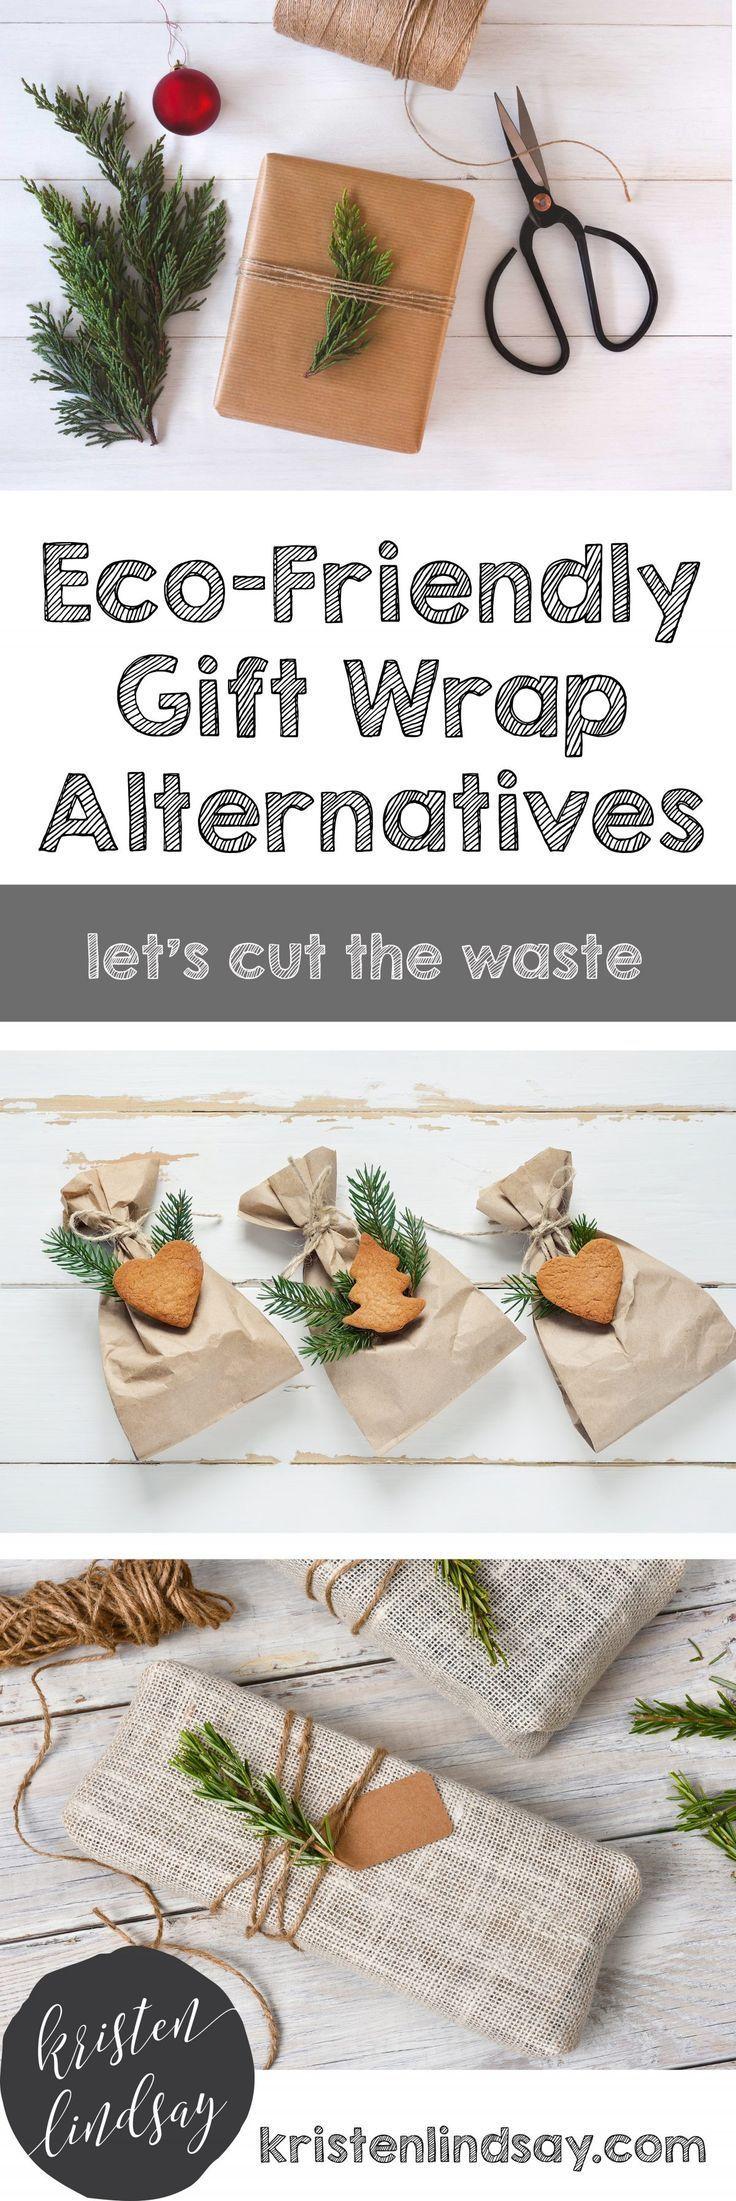 6 Eco-Friendly Gift Wrap Alternatives